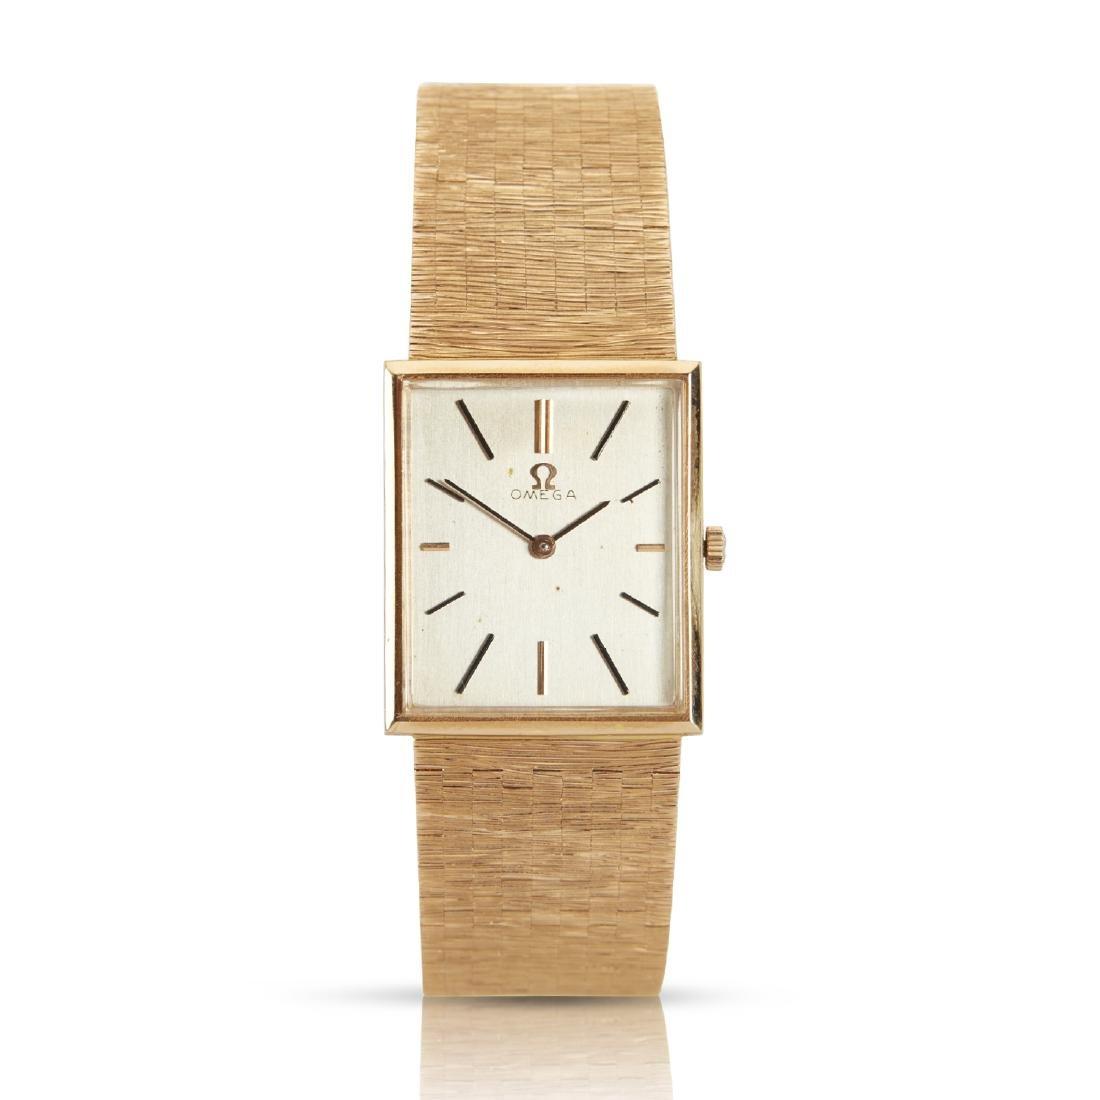 Omega, 18K Dress Watch, Ref. Cal. 620